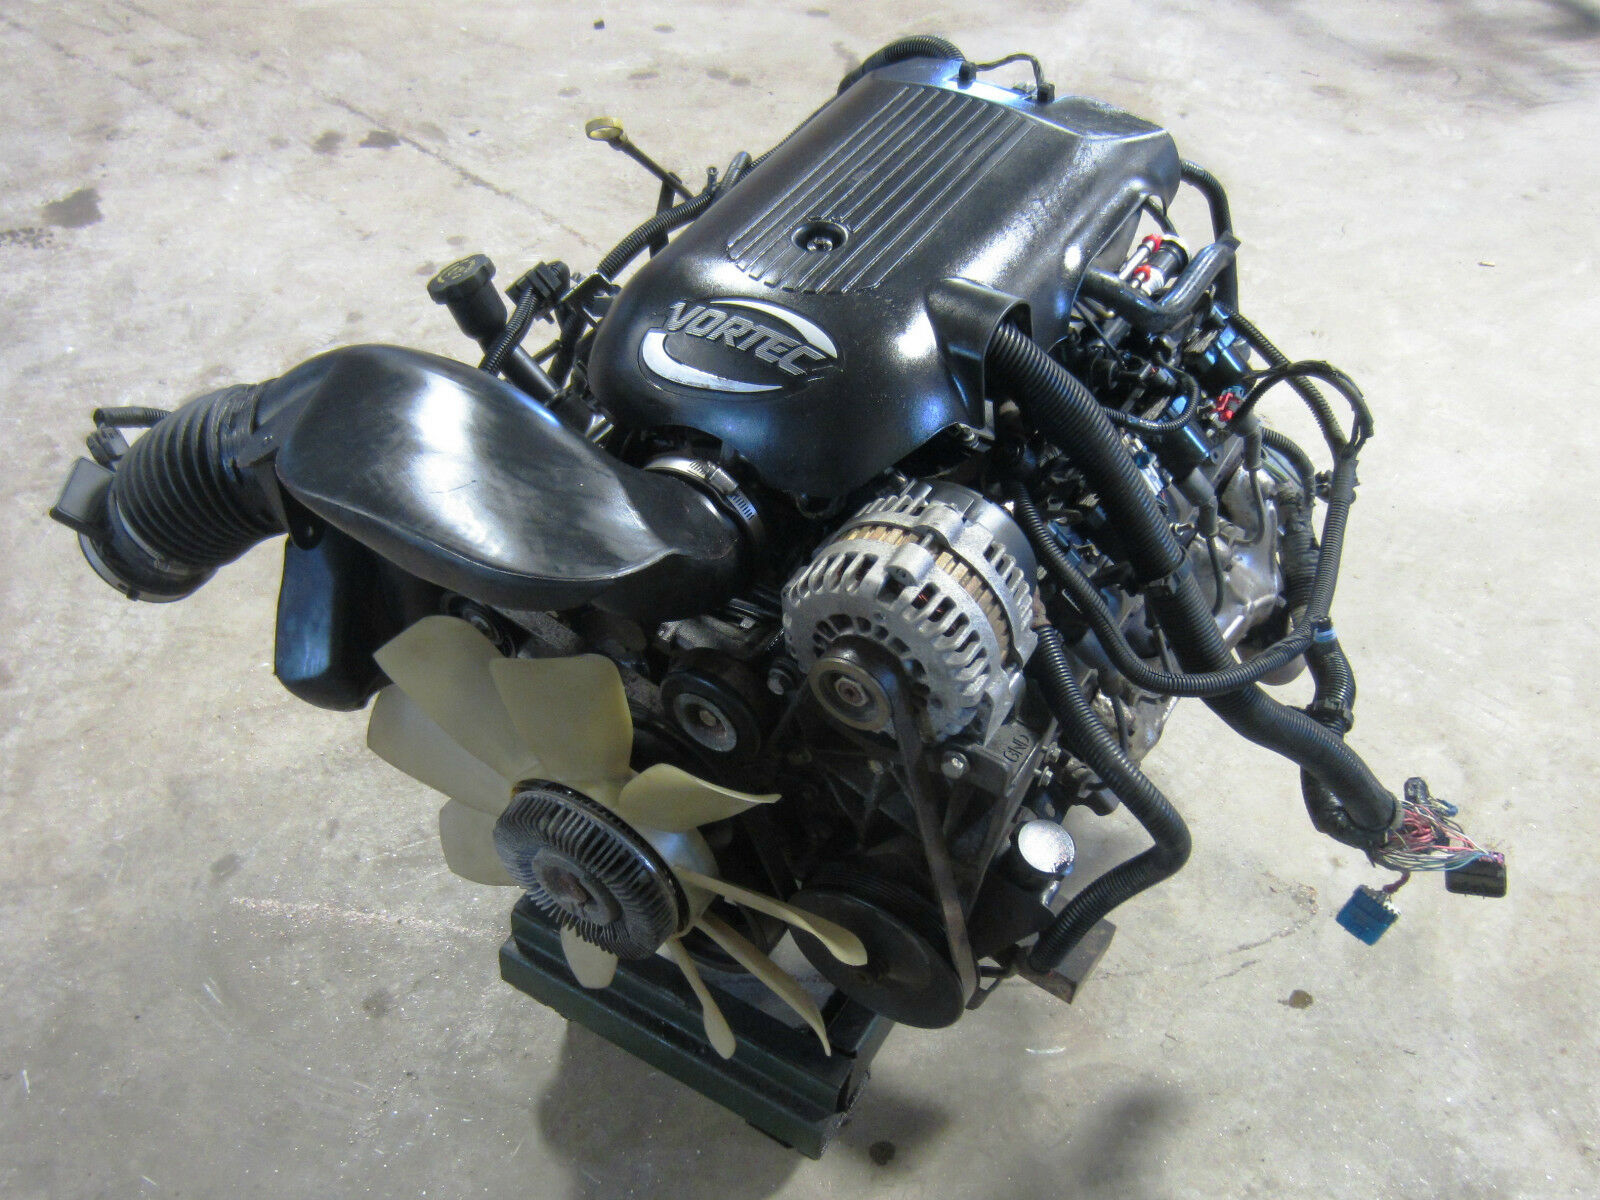 Duramax transmission options - The BangShift.com Forums